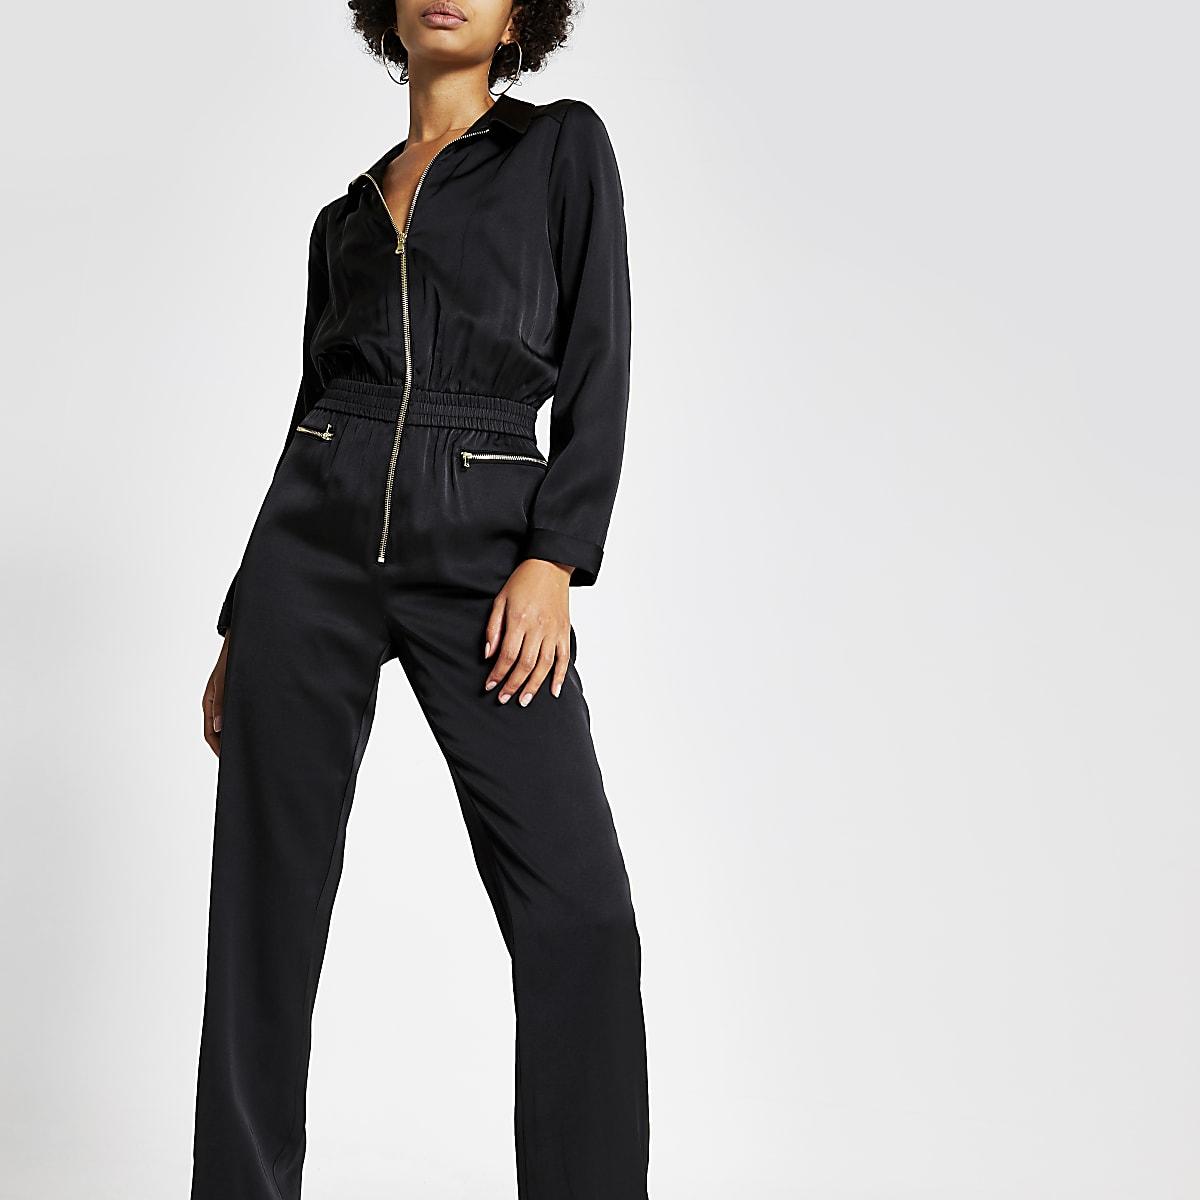 Black satin zip front boiler jumpsuit